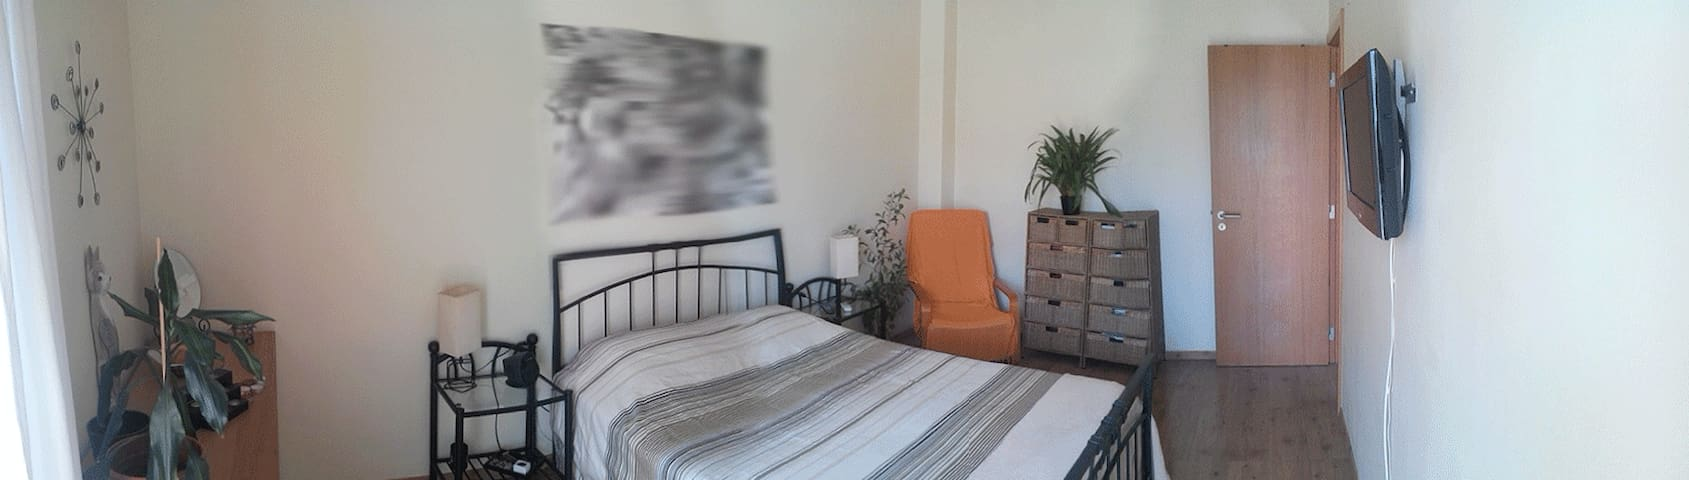 Room Panorama 270º